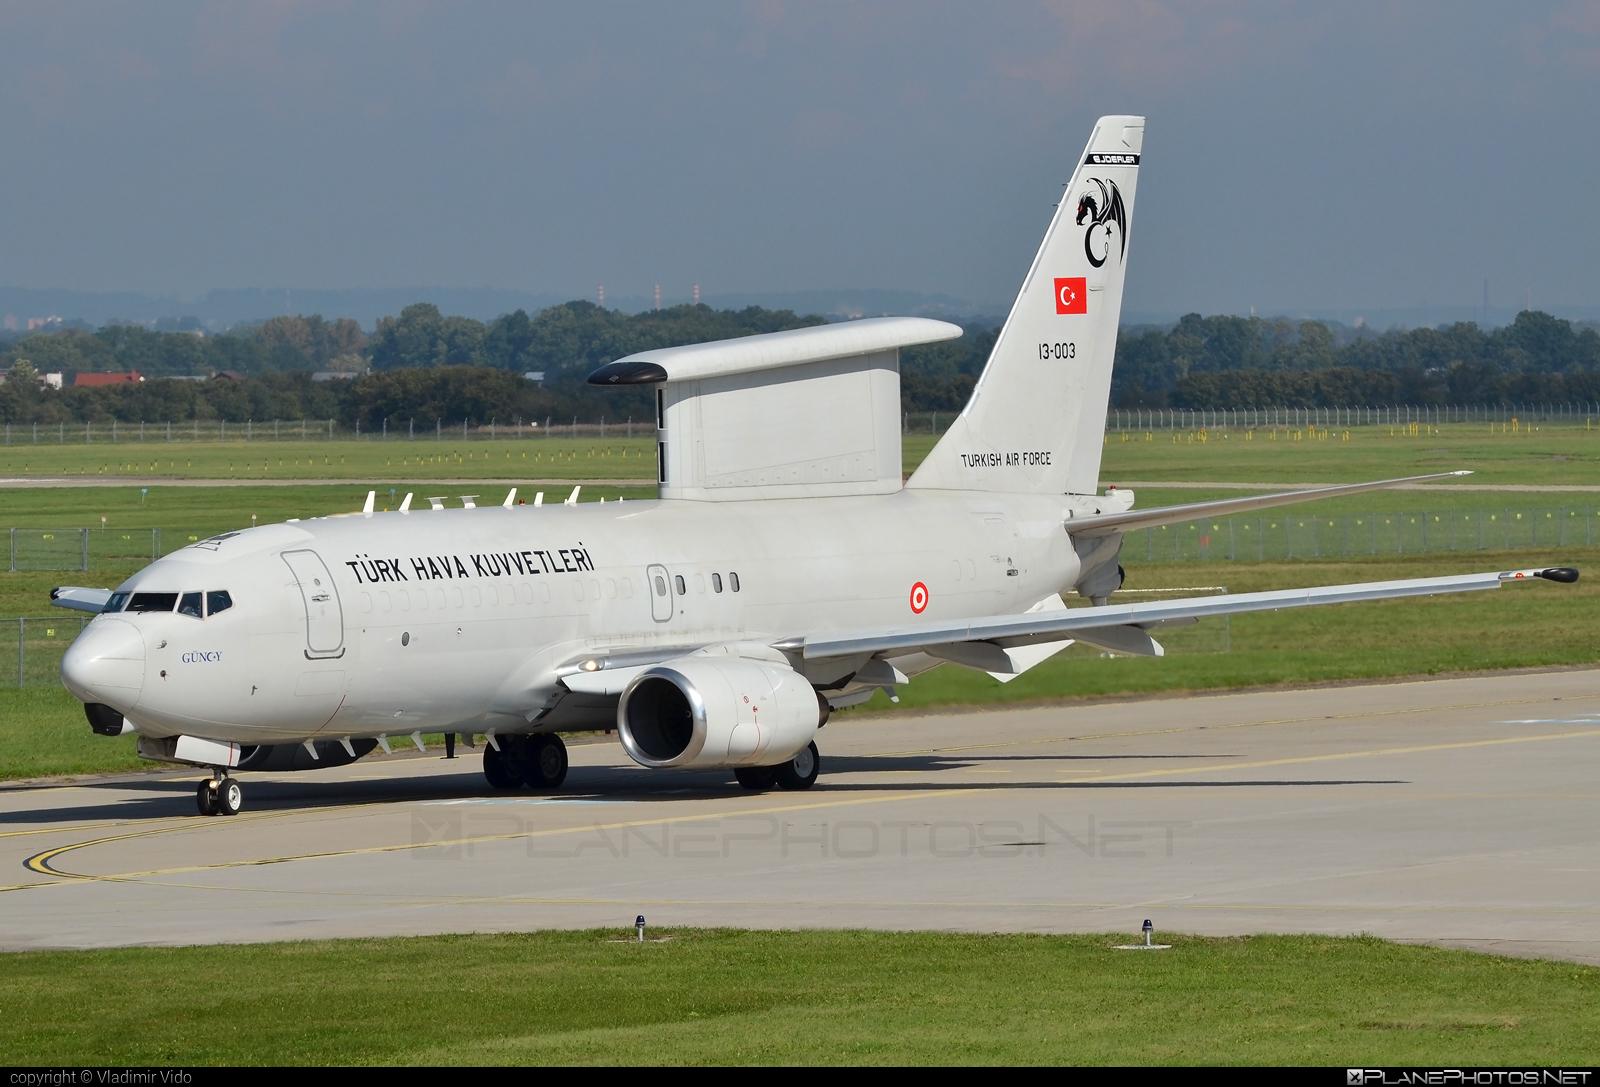 Boeing E-7T Peace Eagle - 13-003 operated by Türk Hava Kuvvetleri (Turkish Air Force) #b737eawc #boeing #e7t #e7wedgetail #peaceeagle #turkishairforce